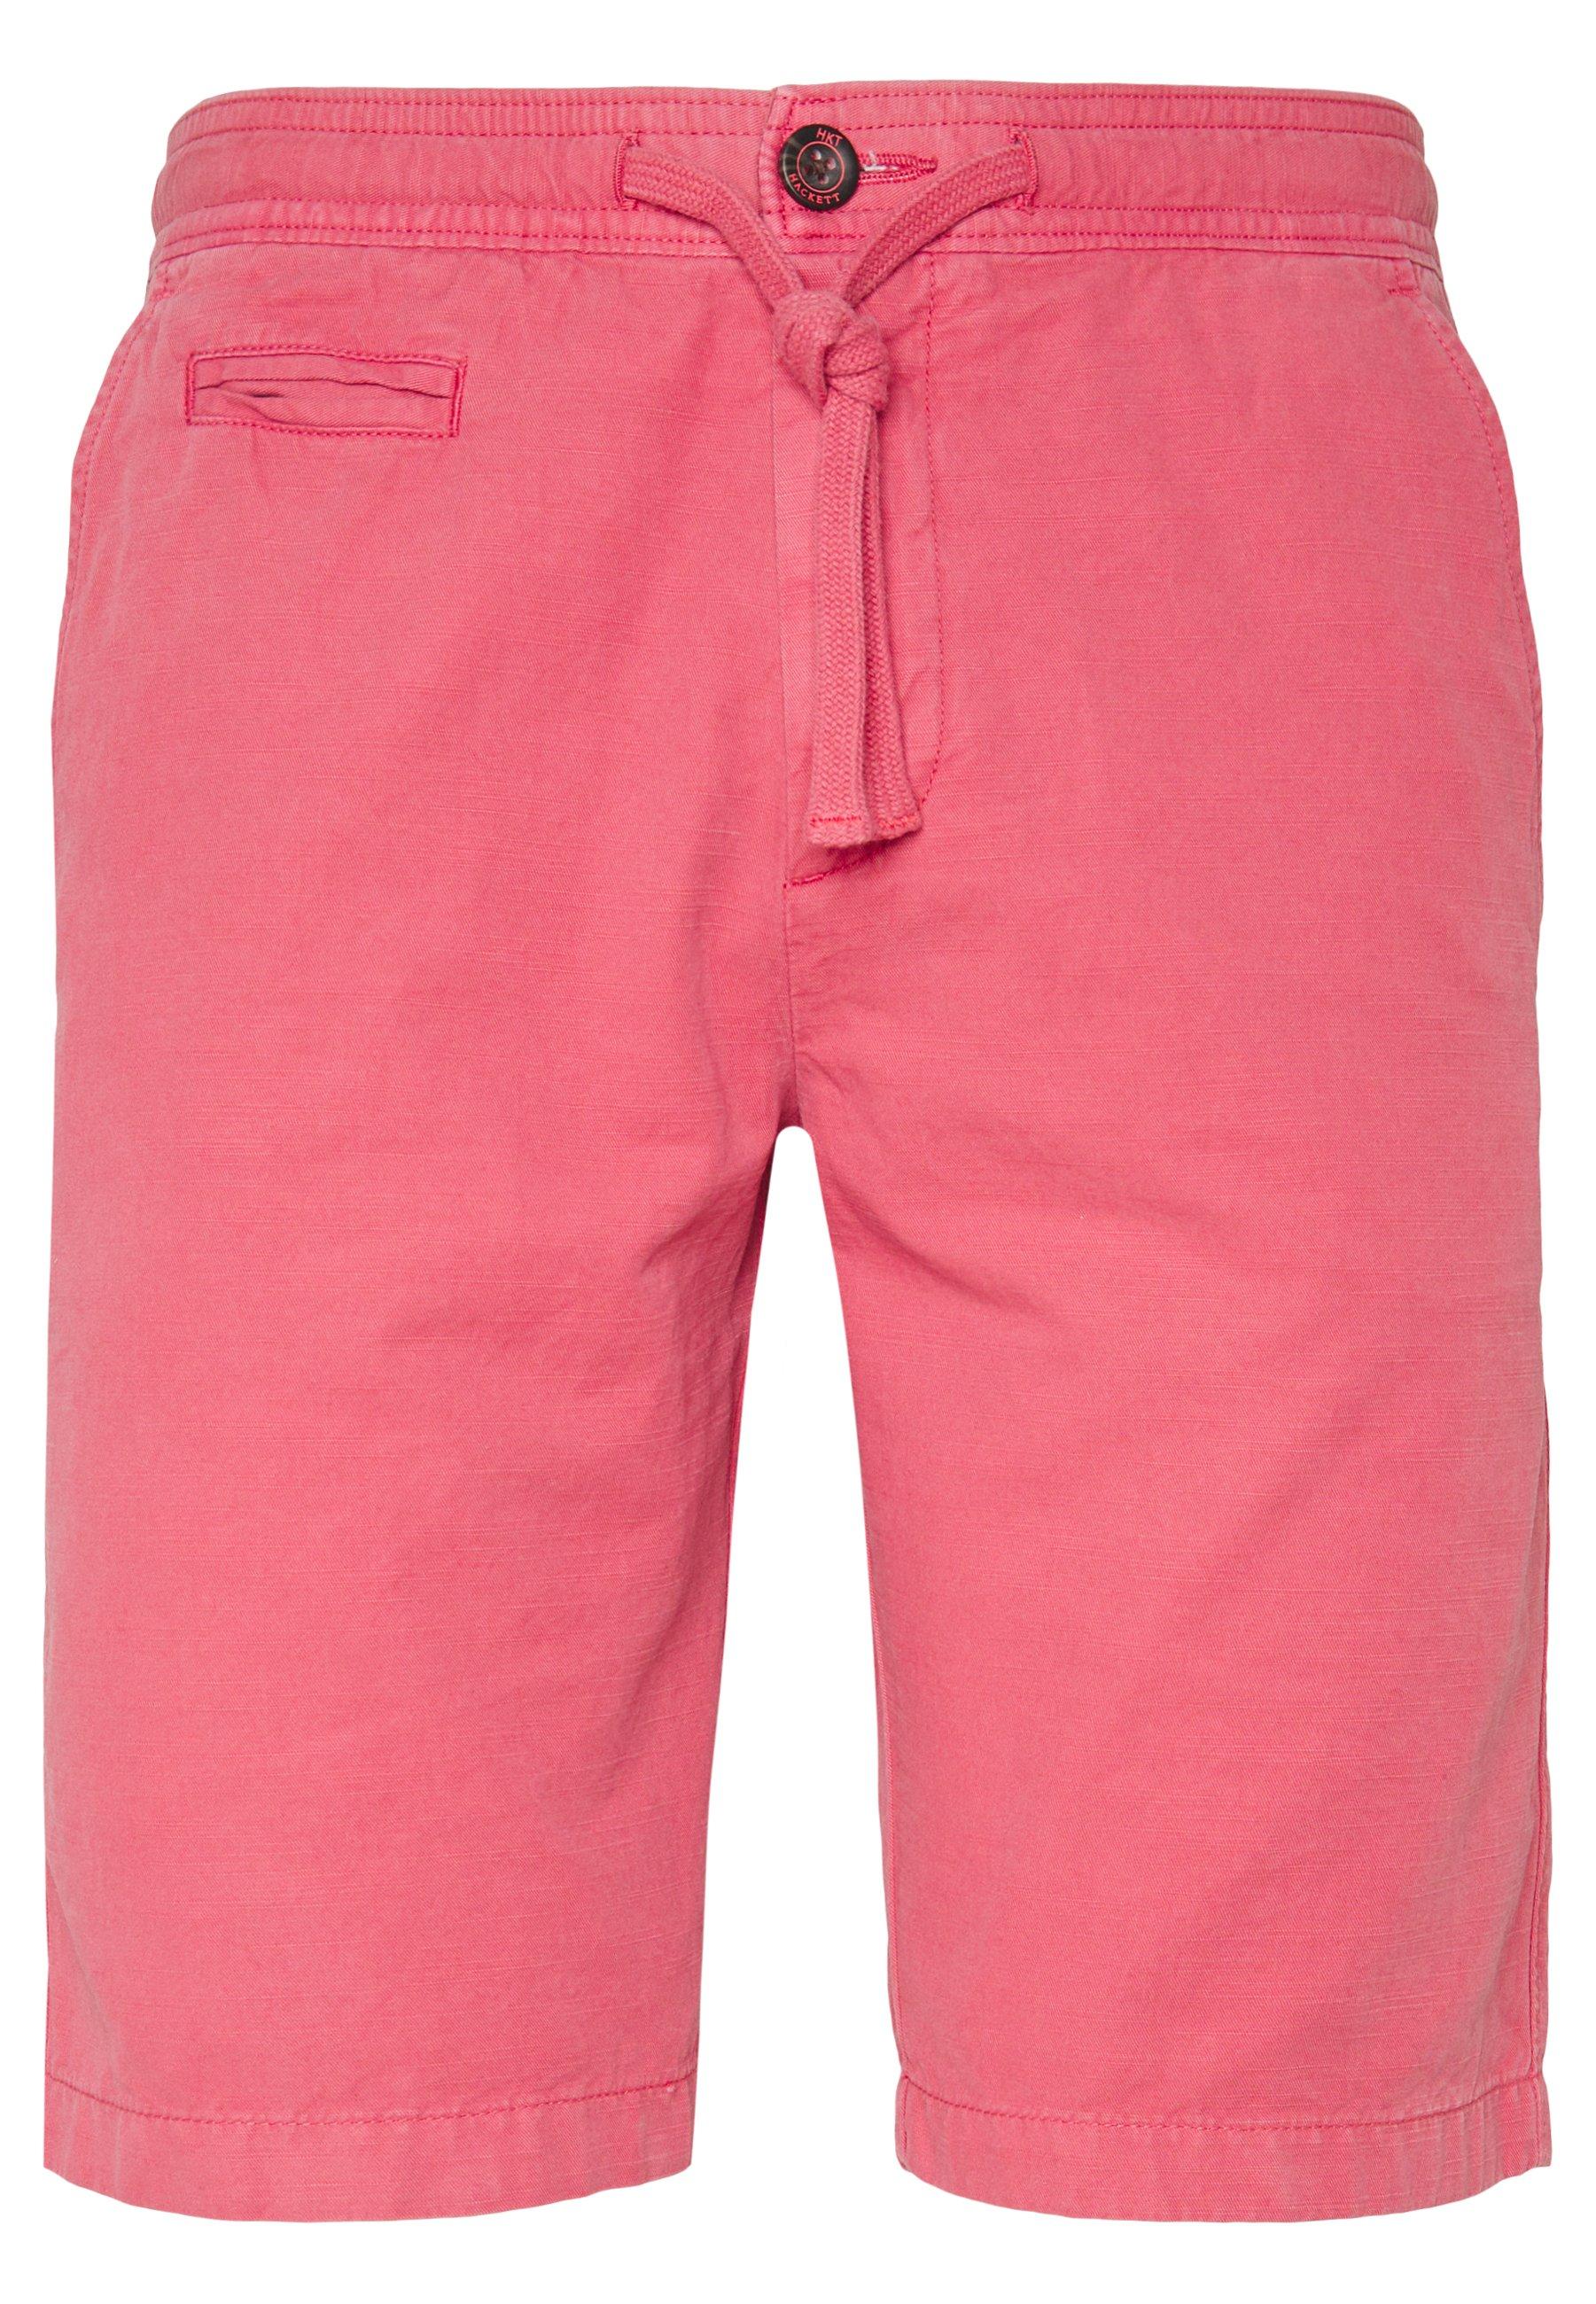 Hkt By Hackett Lounge - Shorts Jack Red